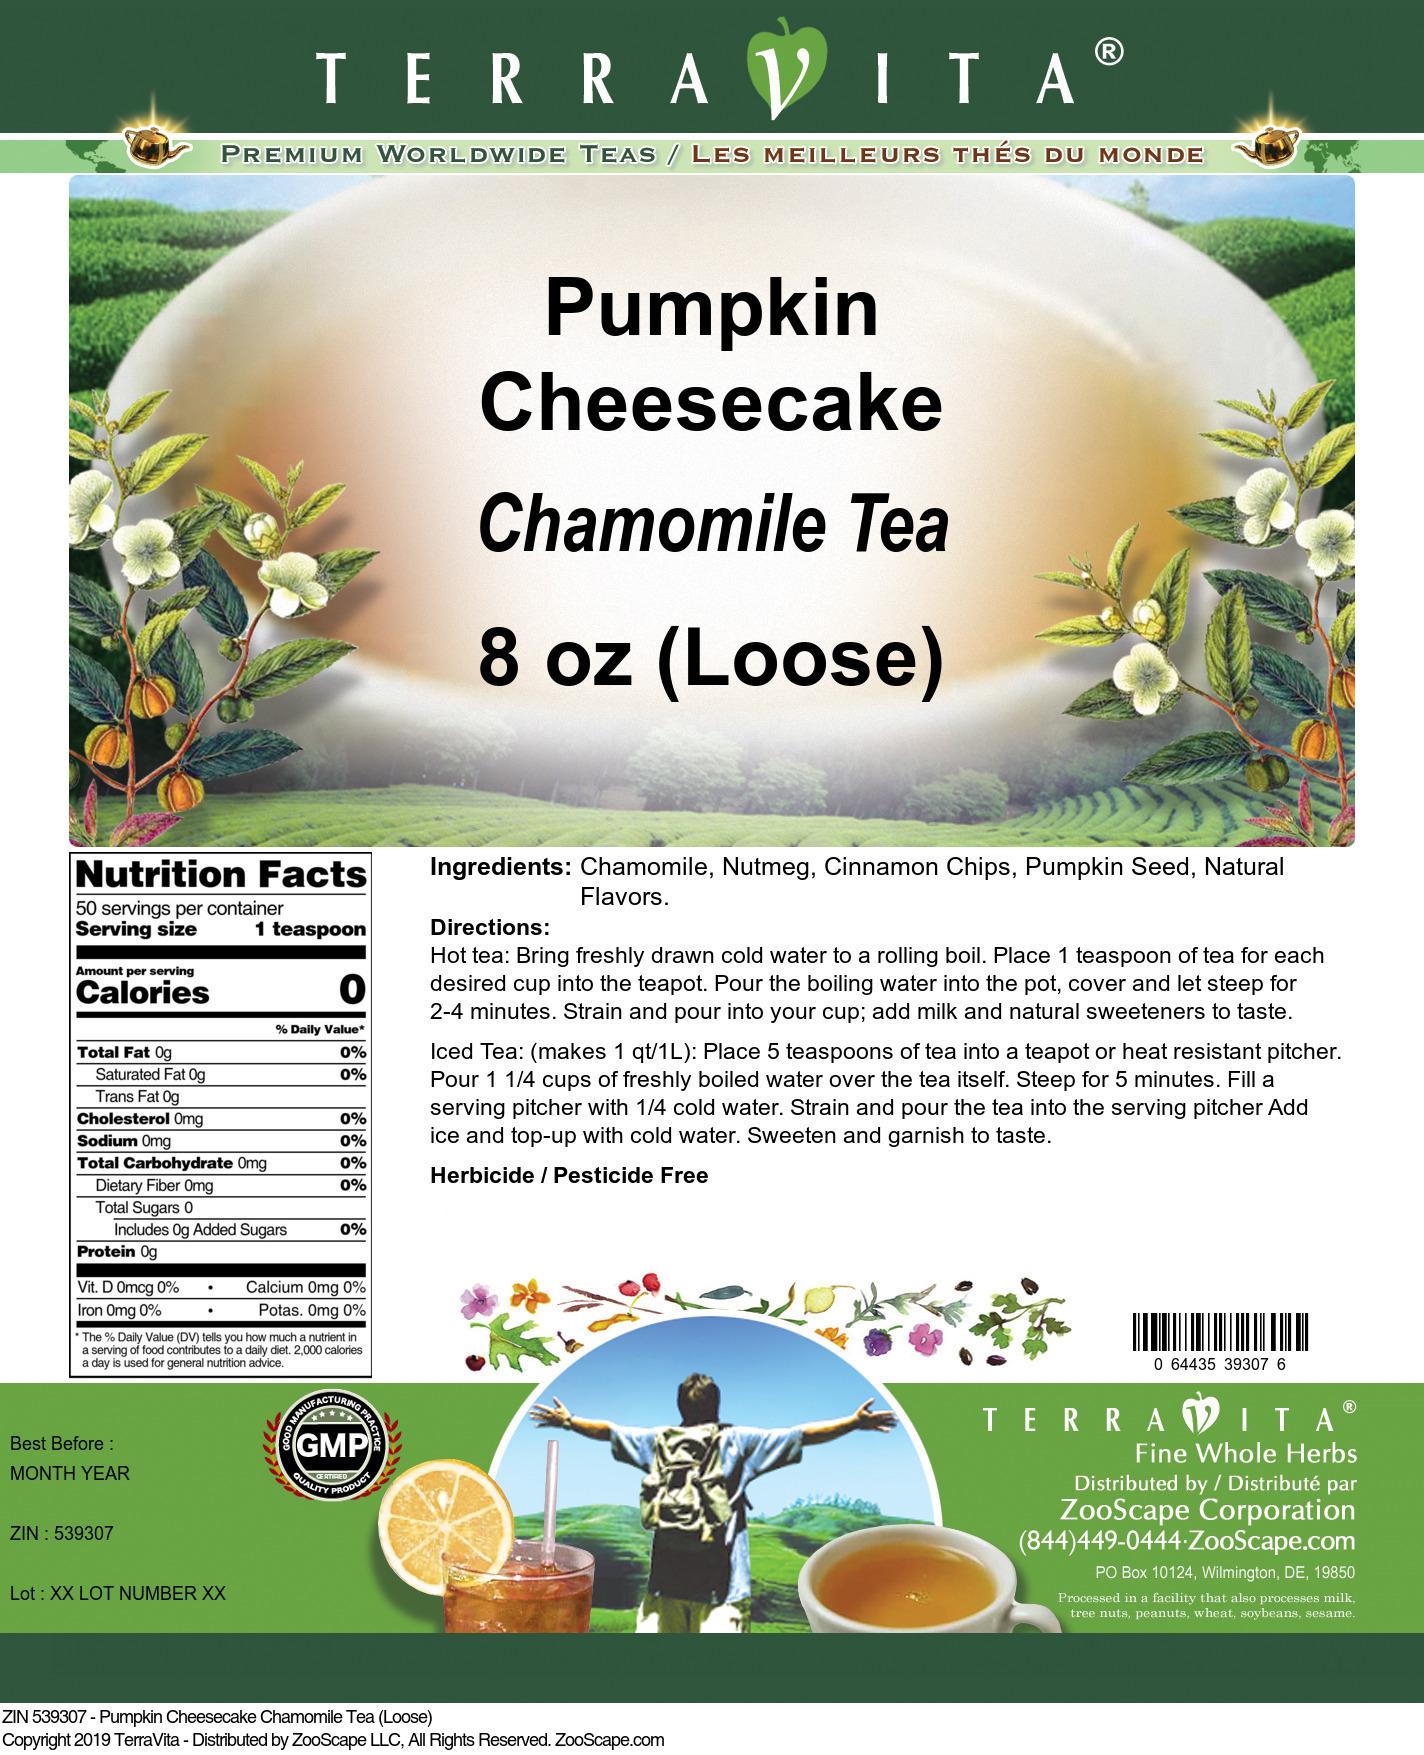 Pumpkin Cheesecake Chamomile Tea (Loose)